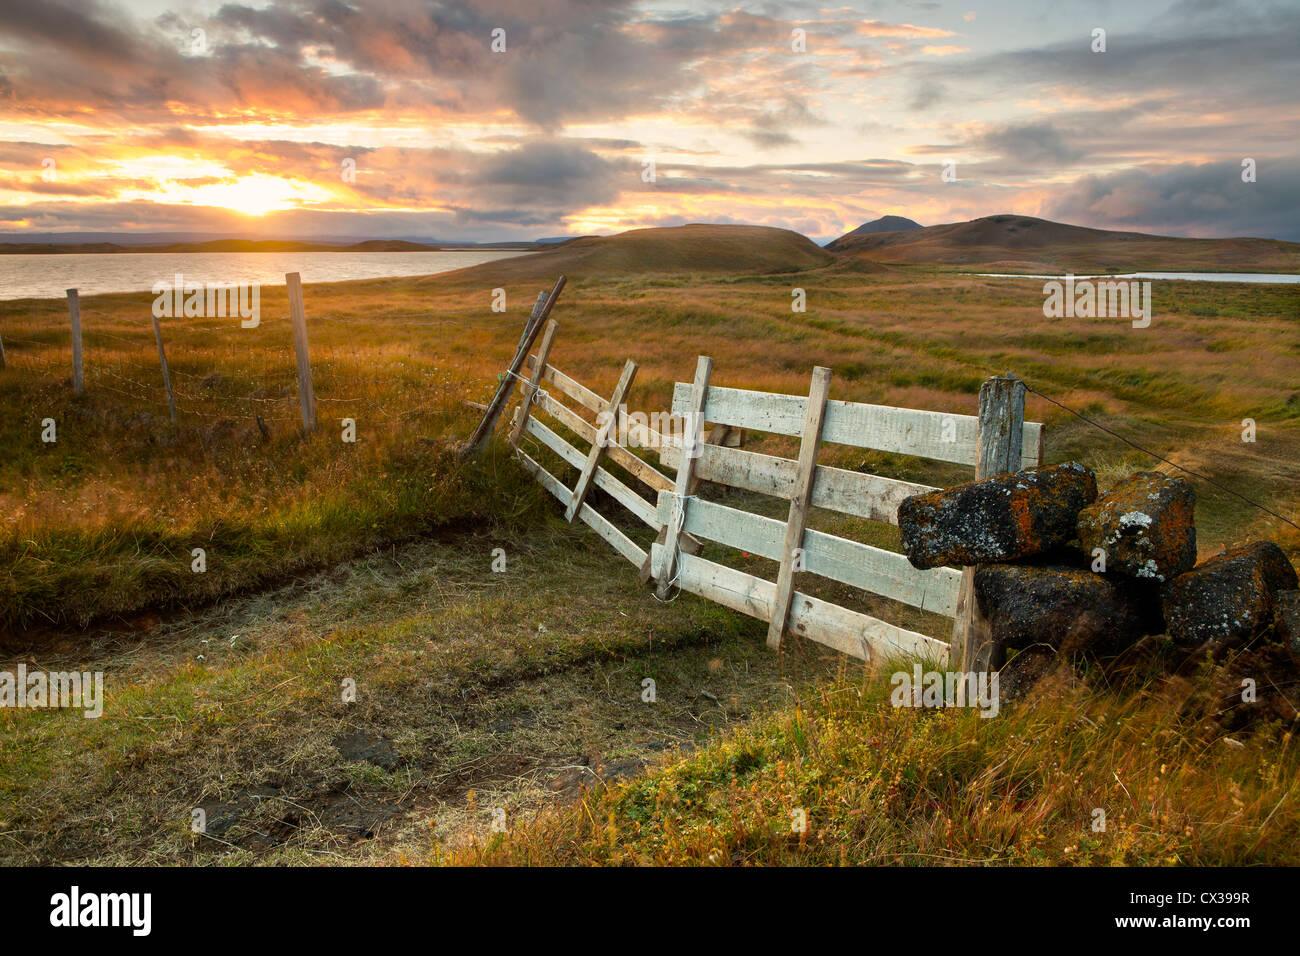 Sun Setting at Lake Myvatn - Stock Image